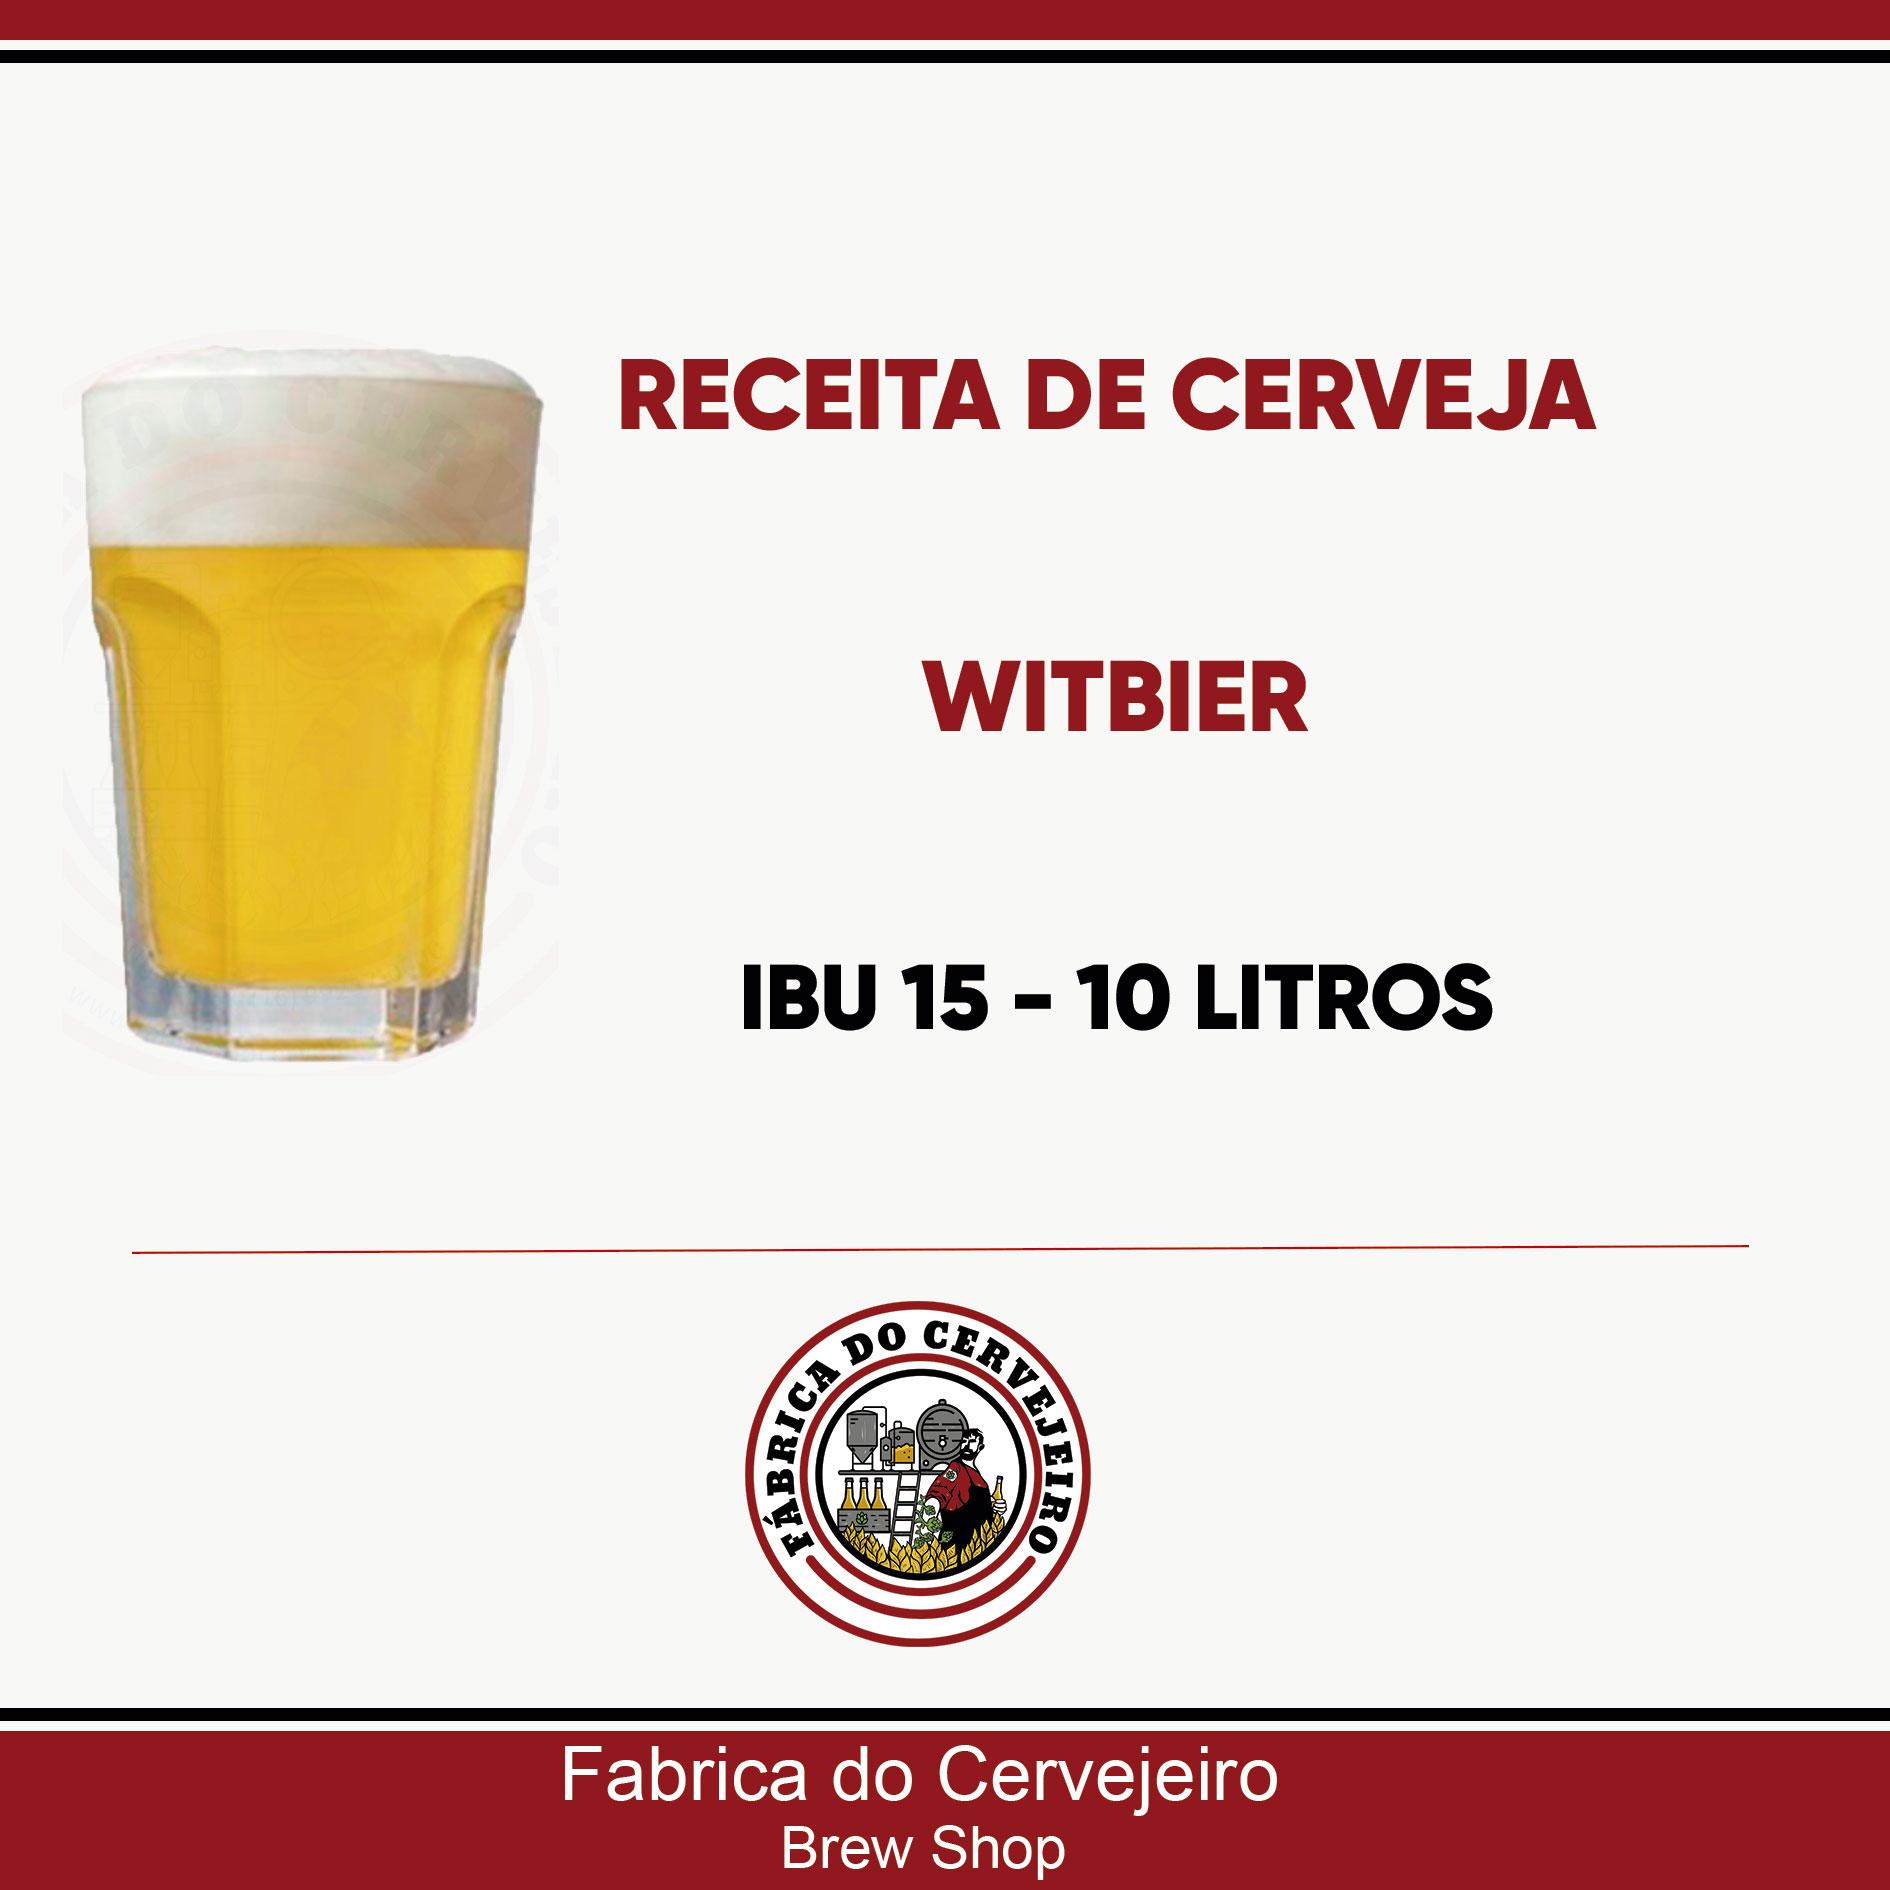 Receita de Witbier 10 Litros